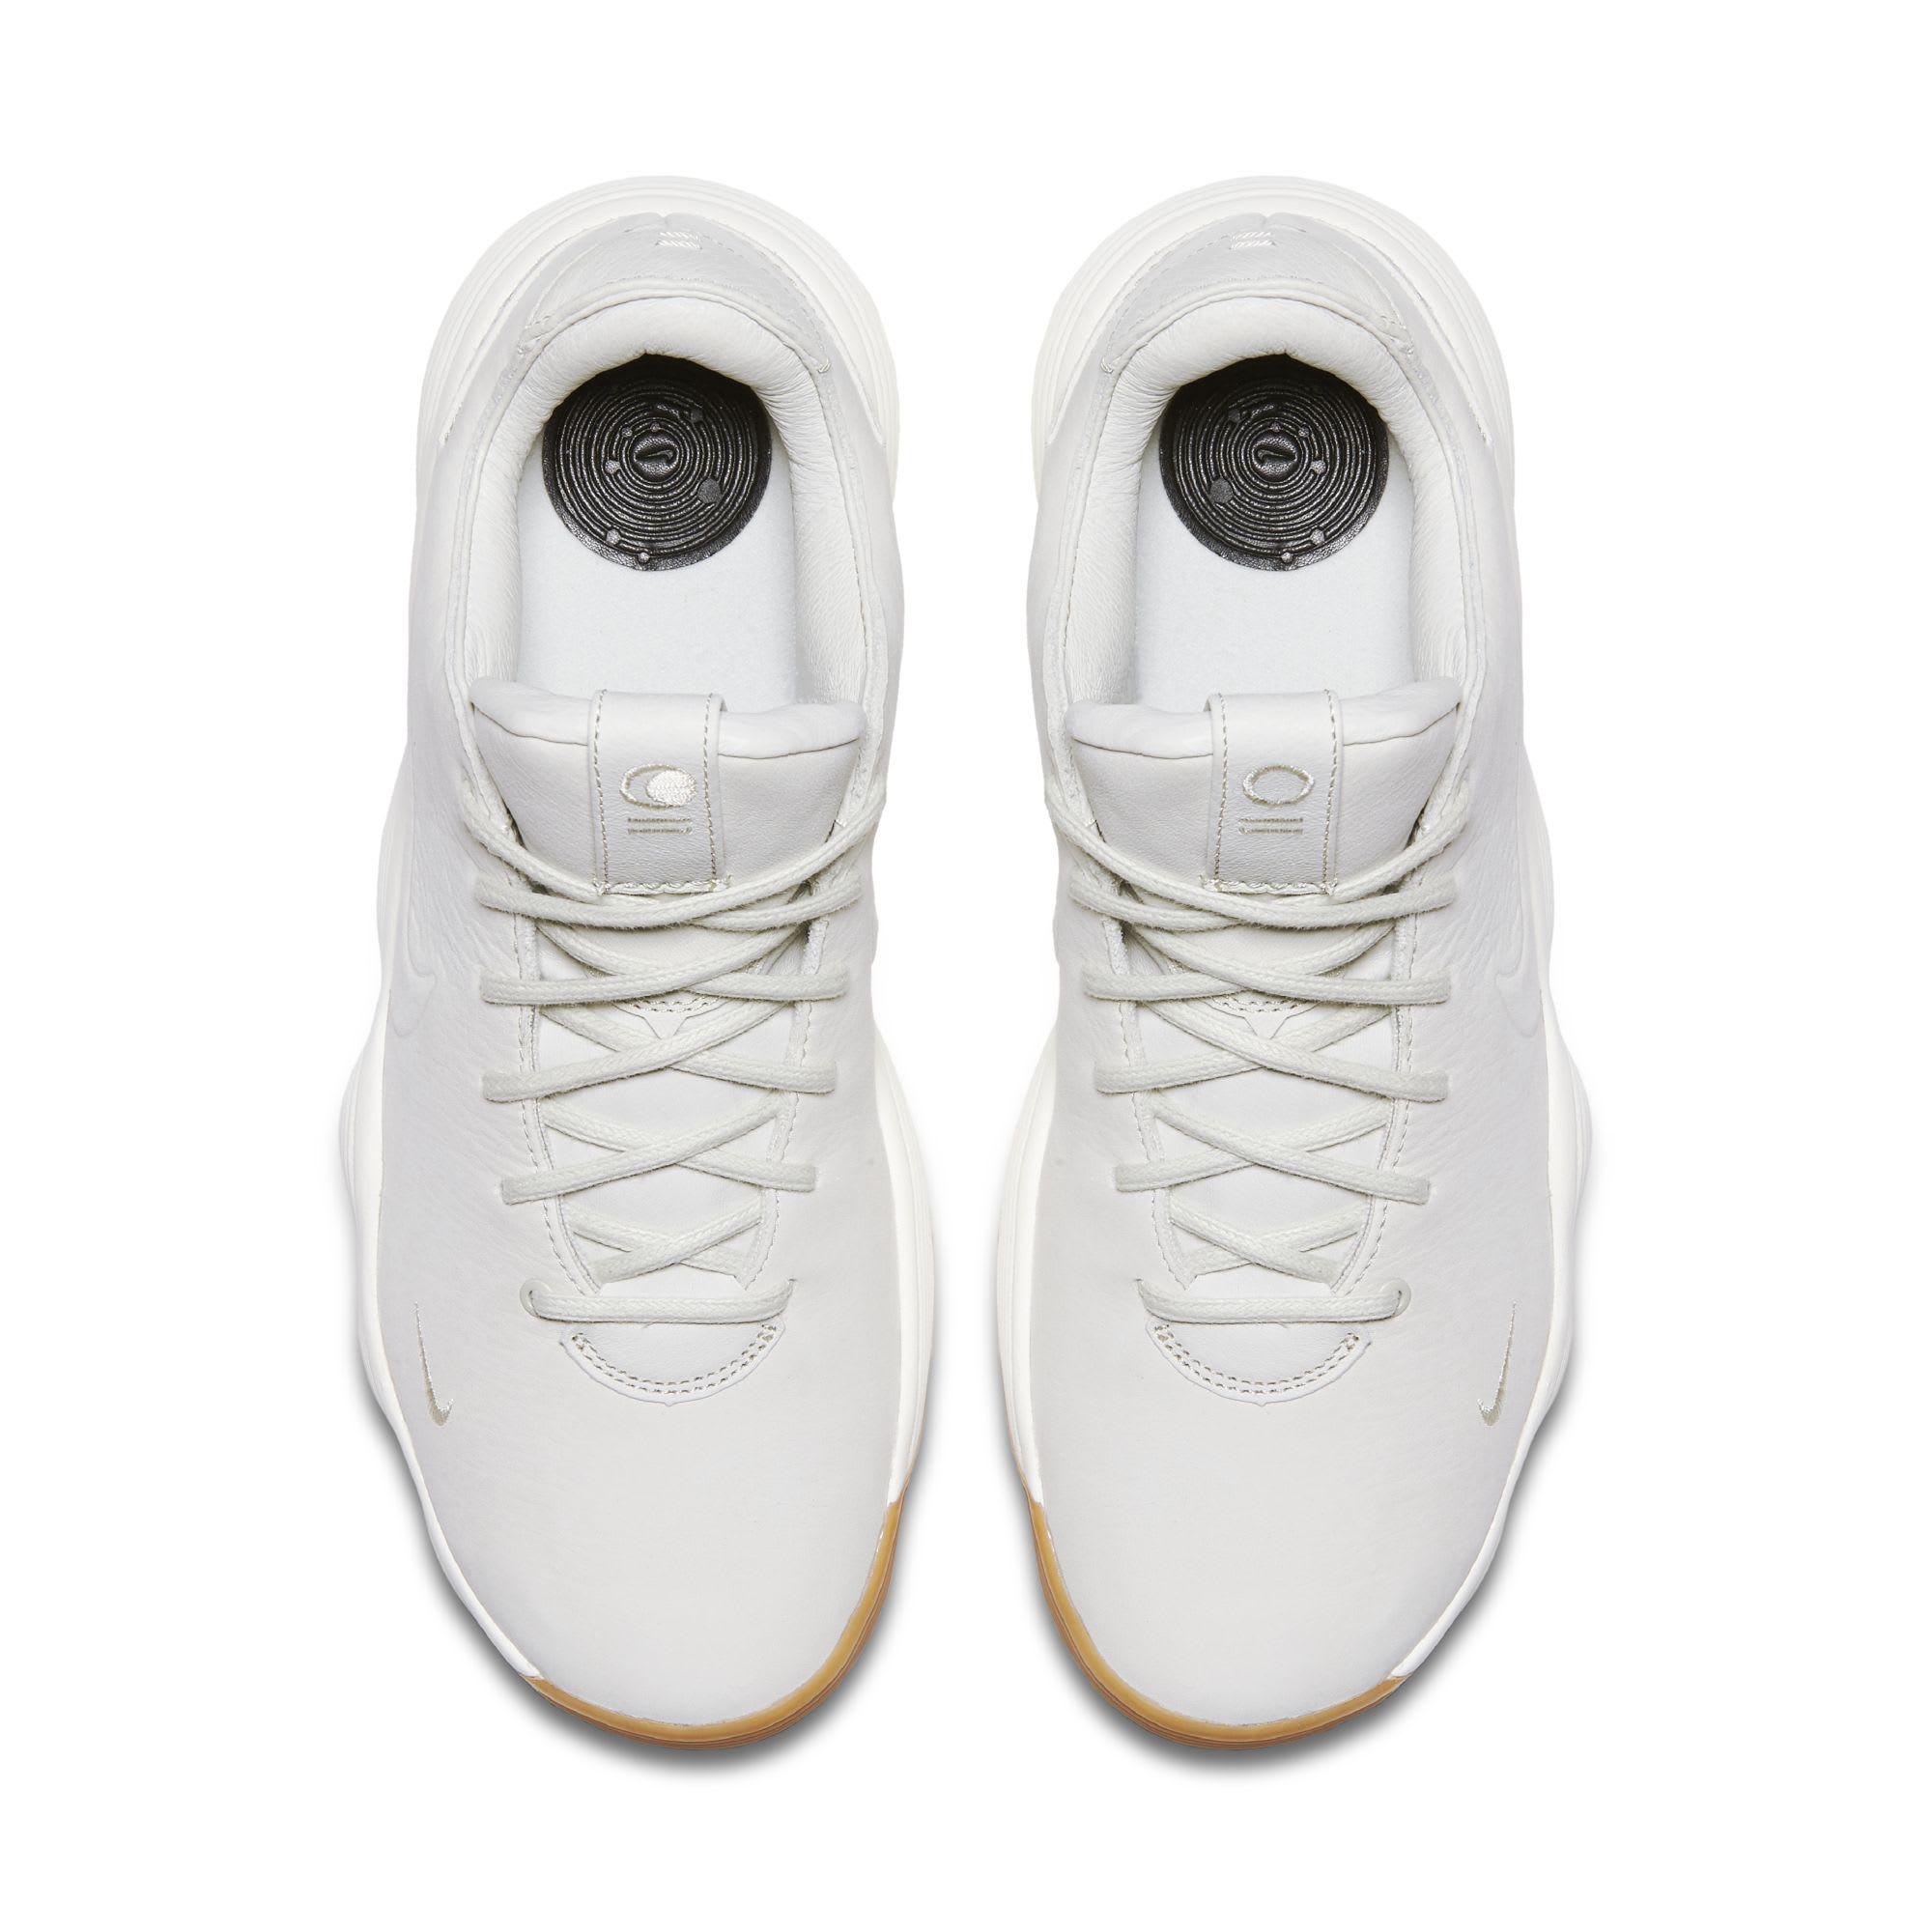 Nike Hyperdunk 2017 Low Lifestyle White (Top)